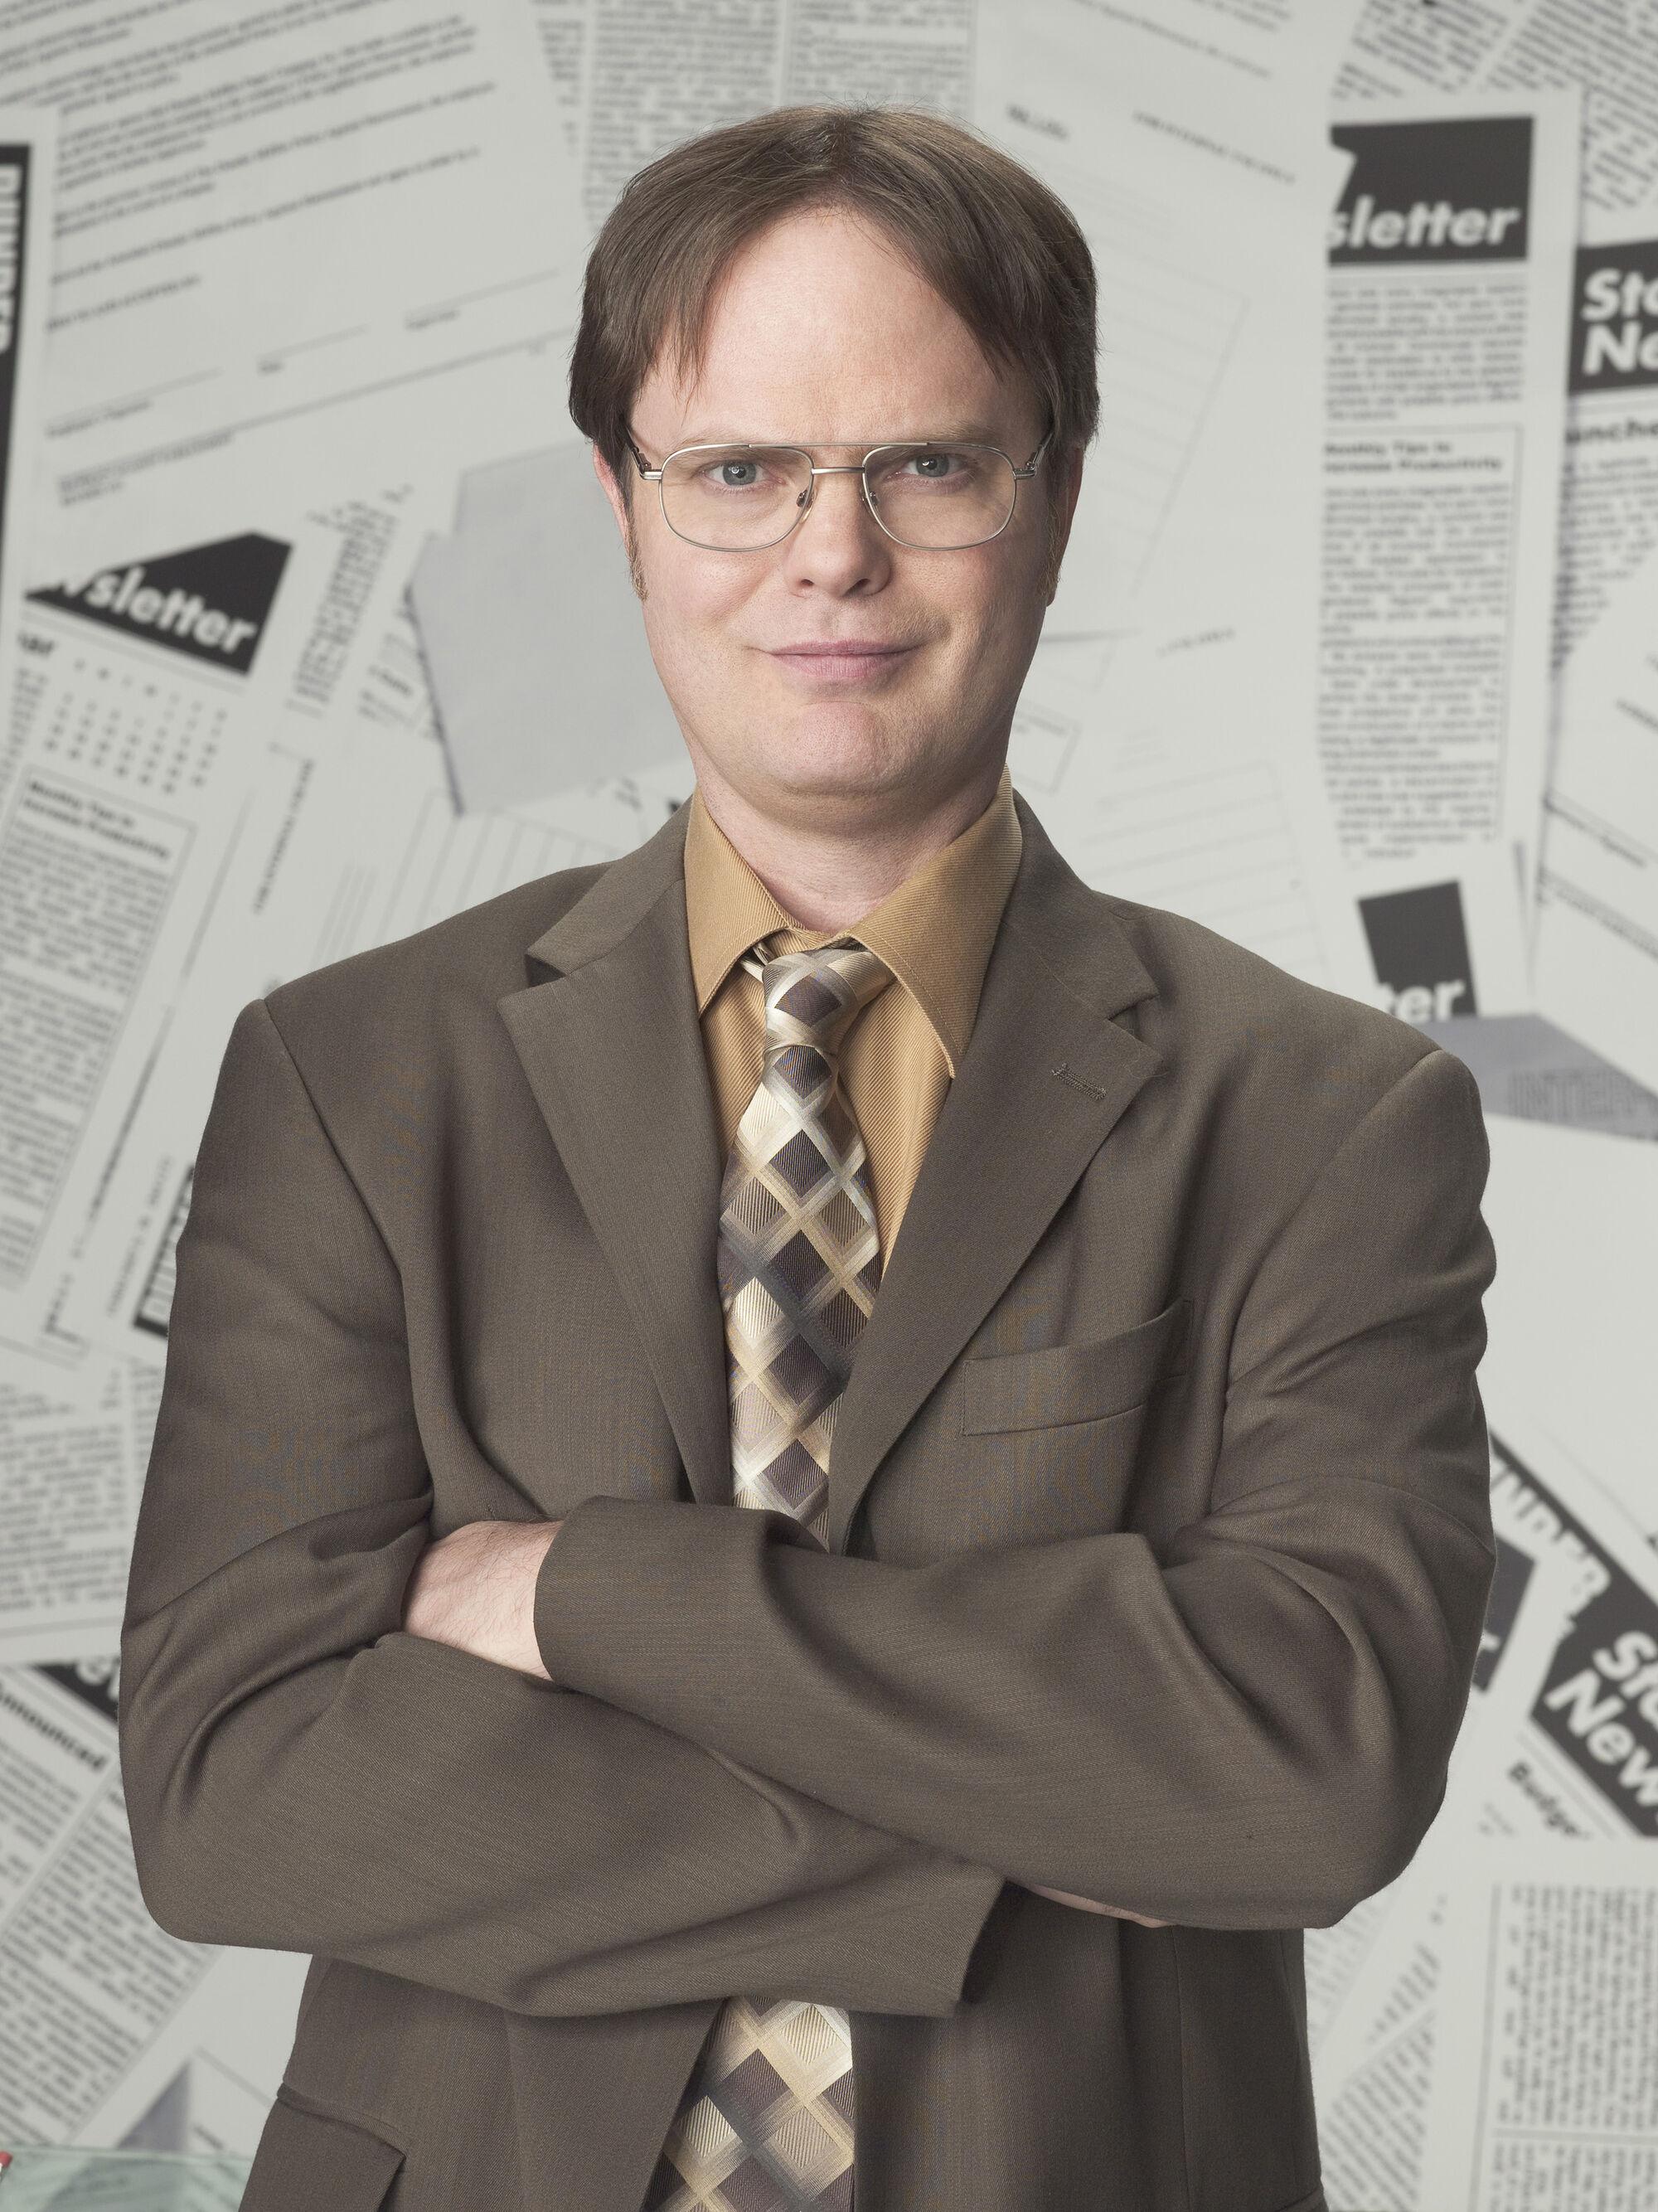 Dwight Schrute | Dunderpedia: The Office Wiki | FANDOM